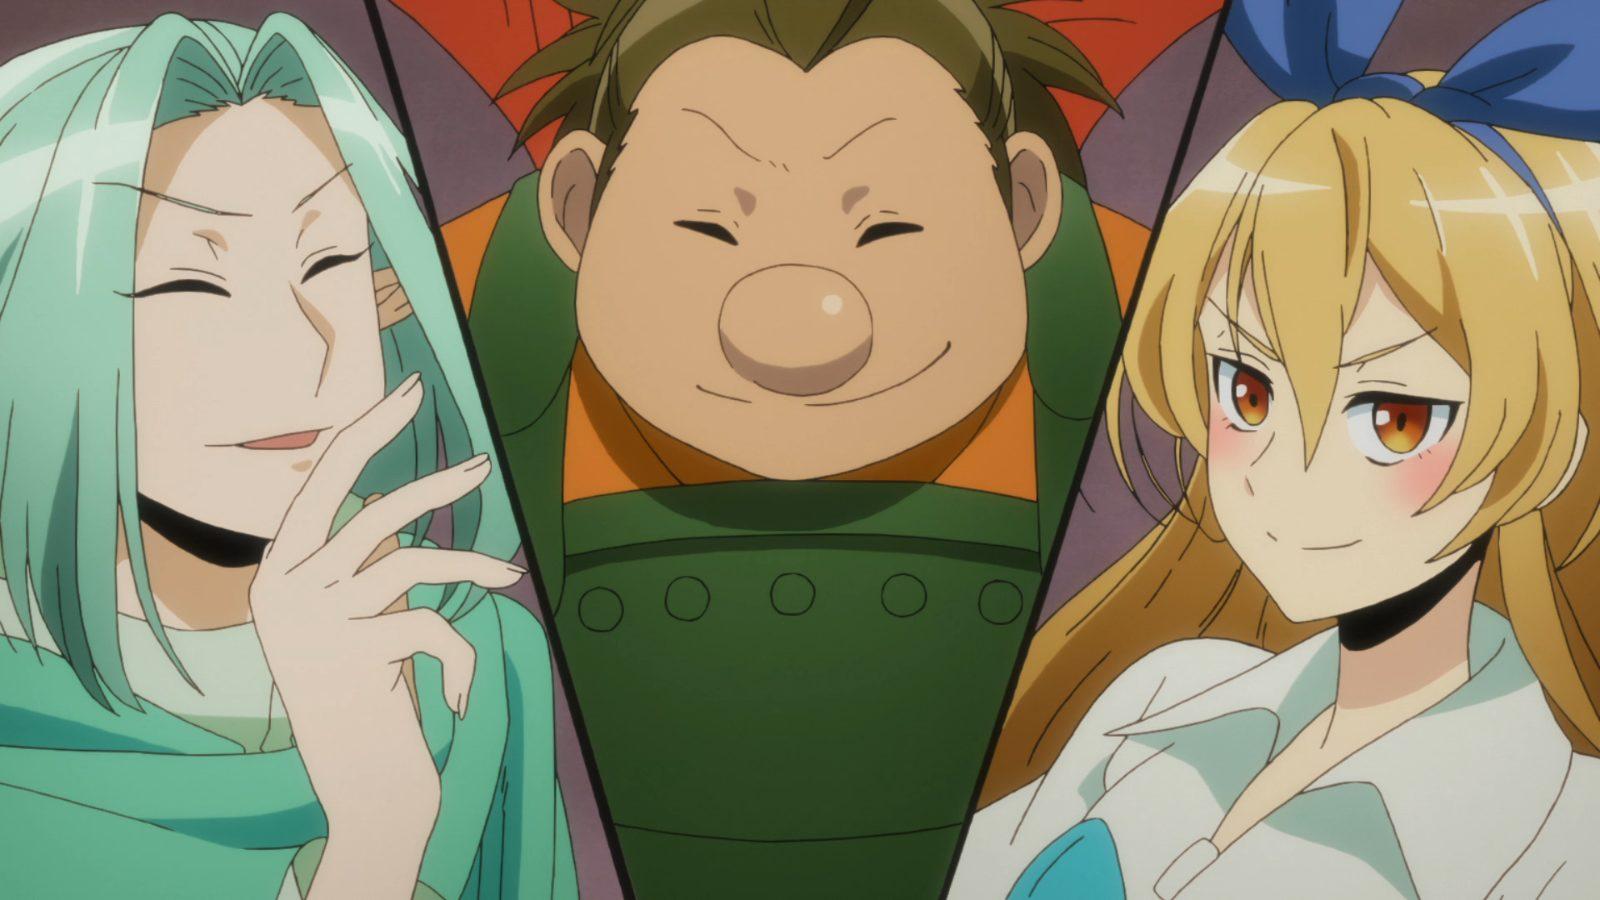 Net-juu no Susume - Capítulo 11 (OVA)